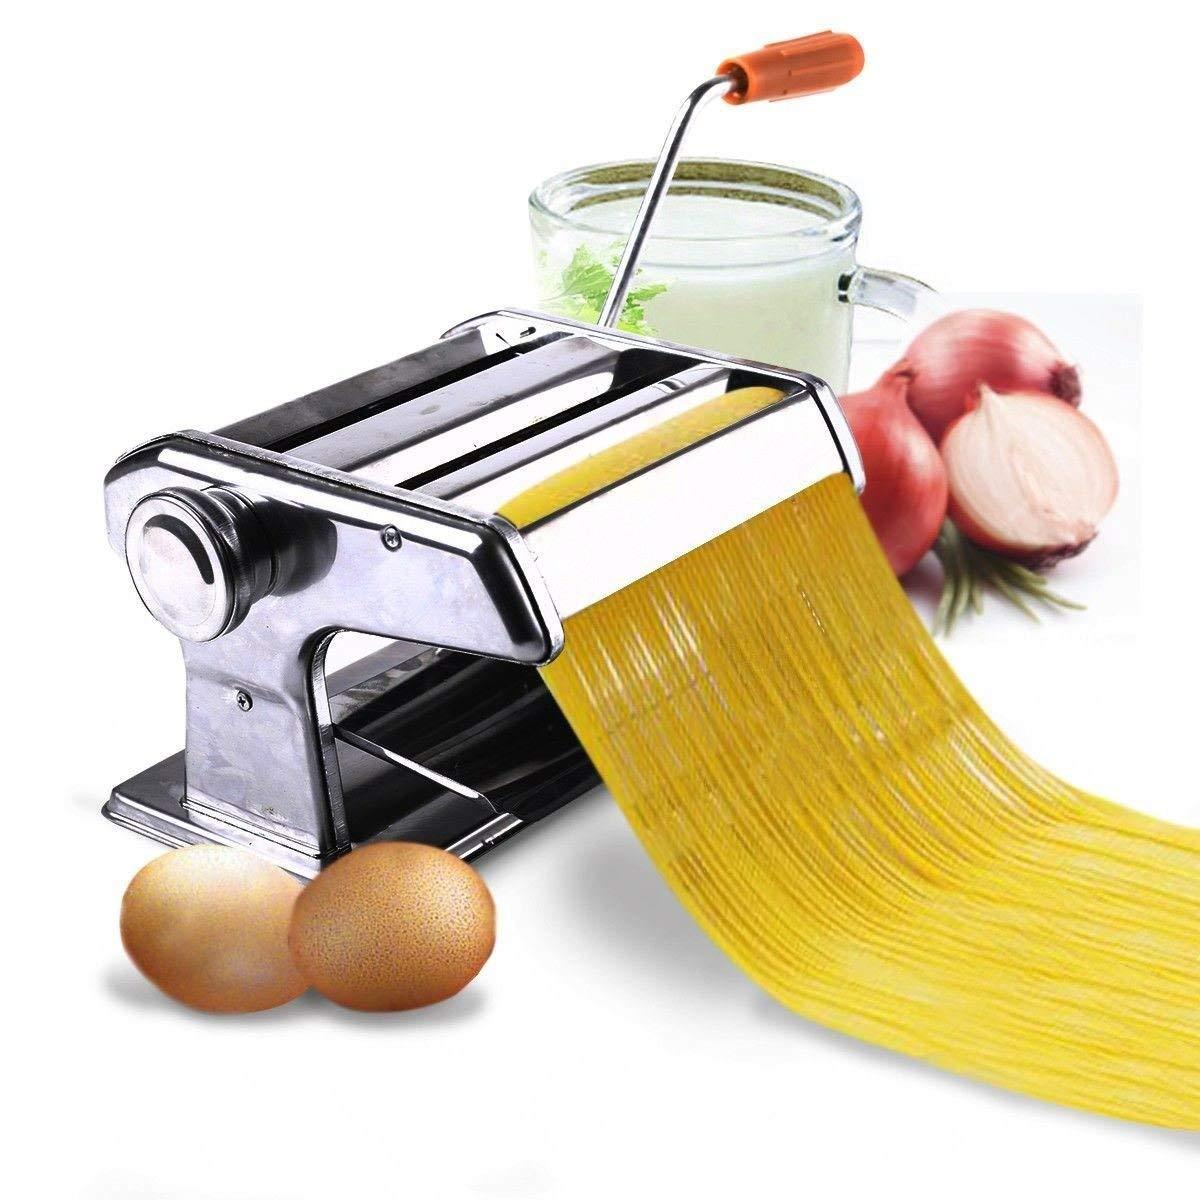 150mm 6inches Pasta Maker & Roller Machine Noodle Spaghetti&fettuccine Maker Health